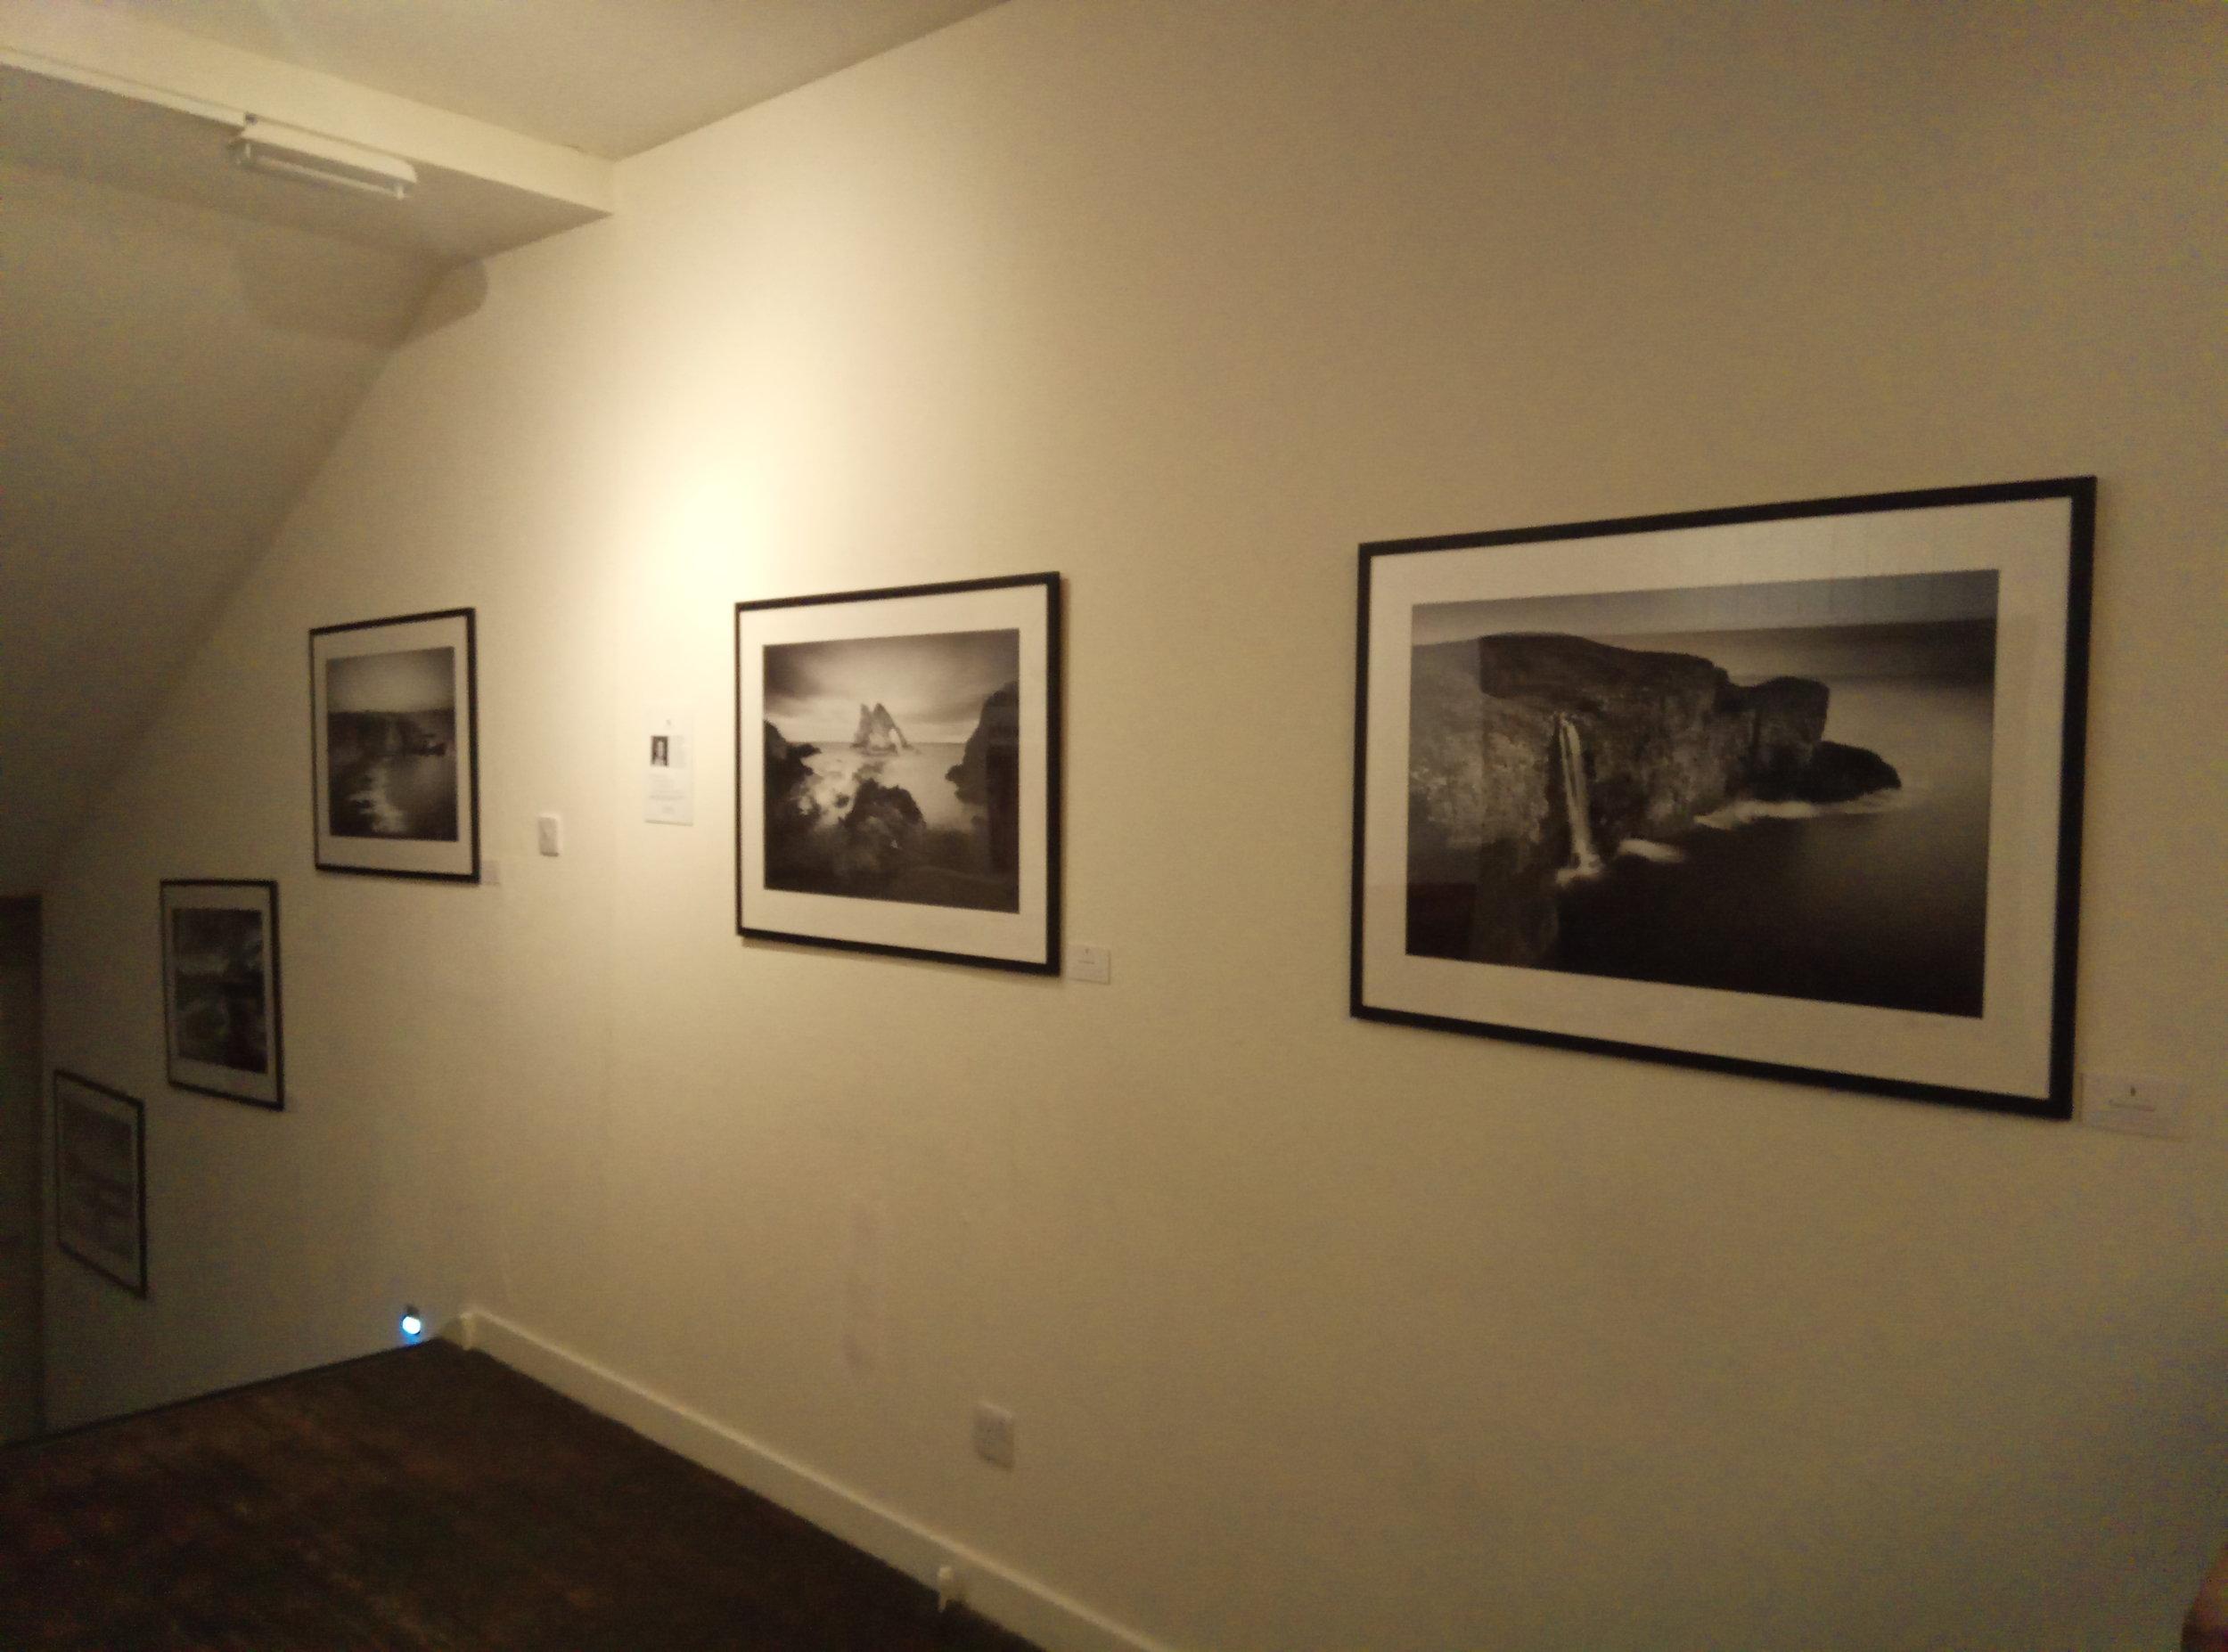 Monochrome Image Exhibit - Icarus Owen